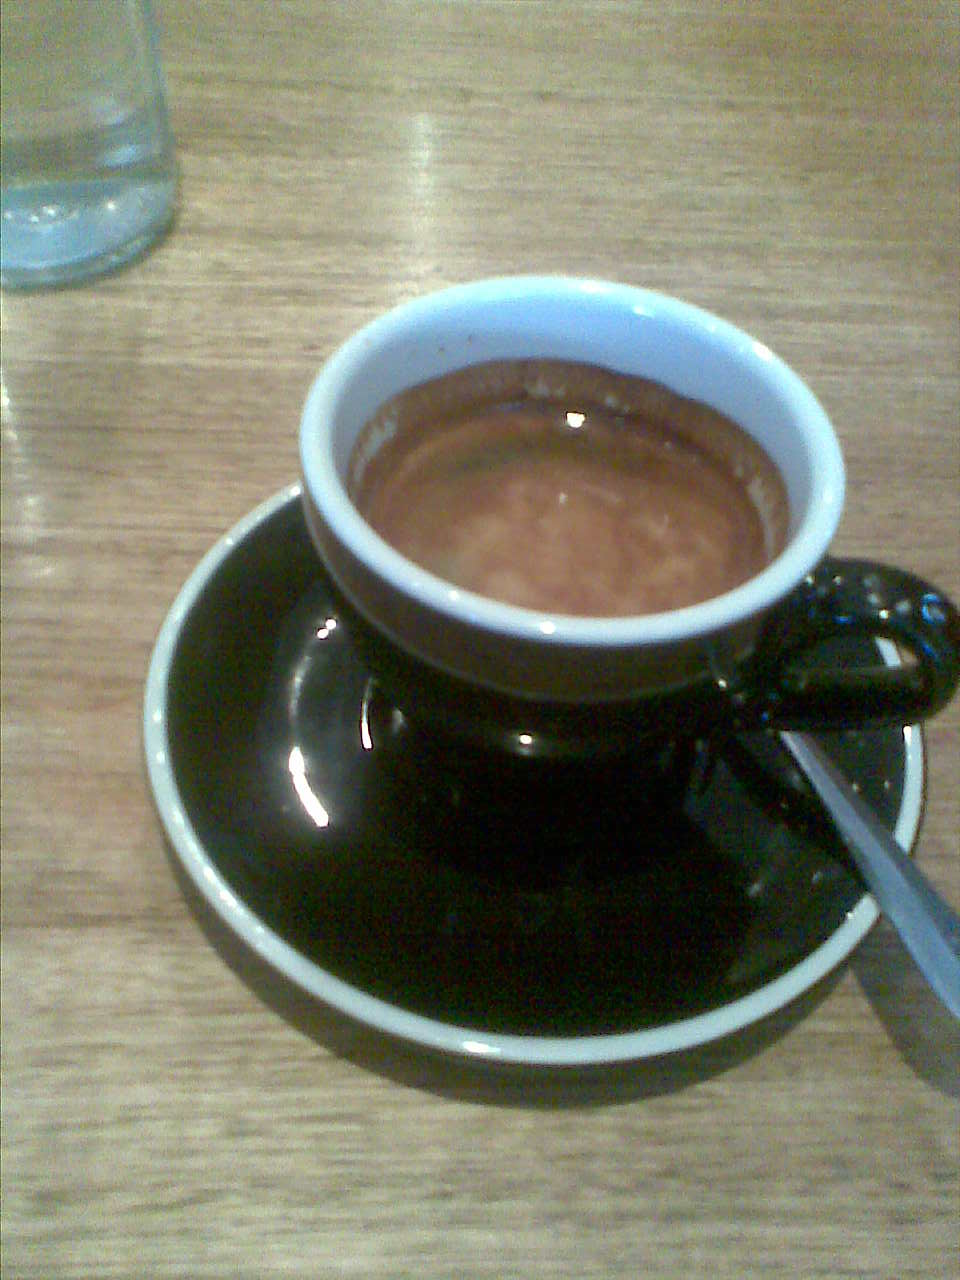 Marmalade Cafe Near Usc